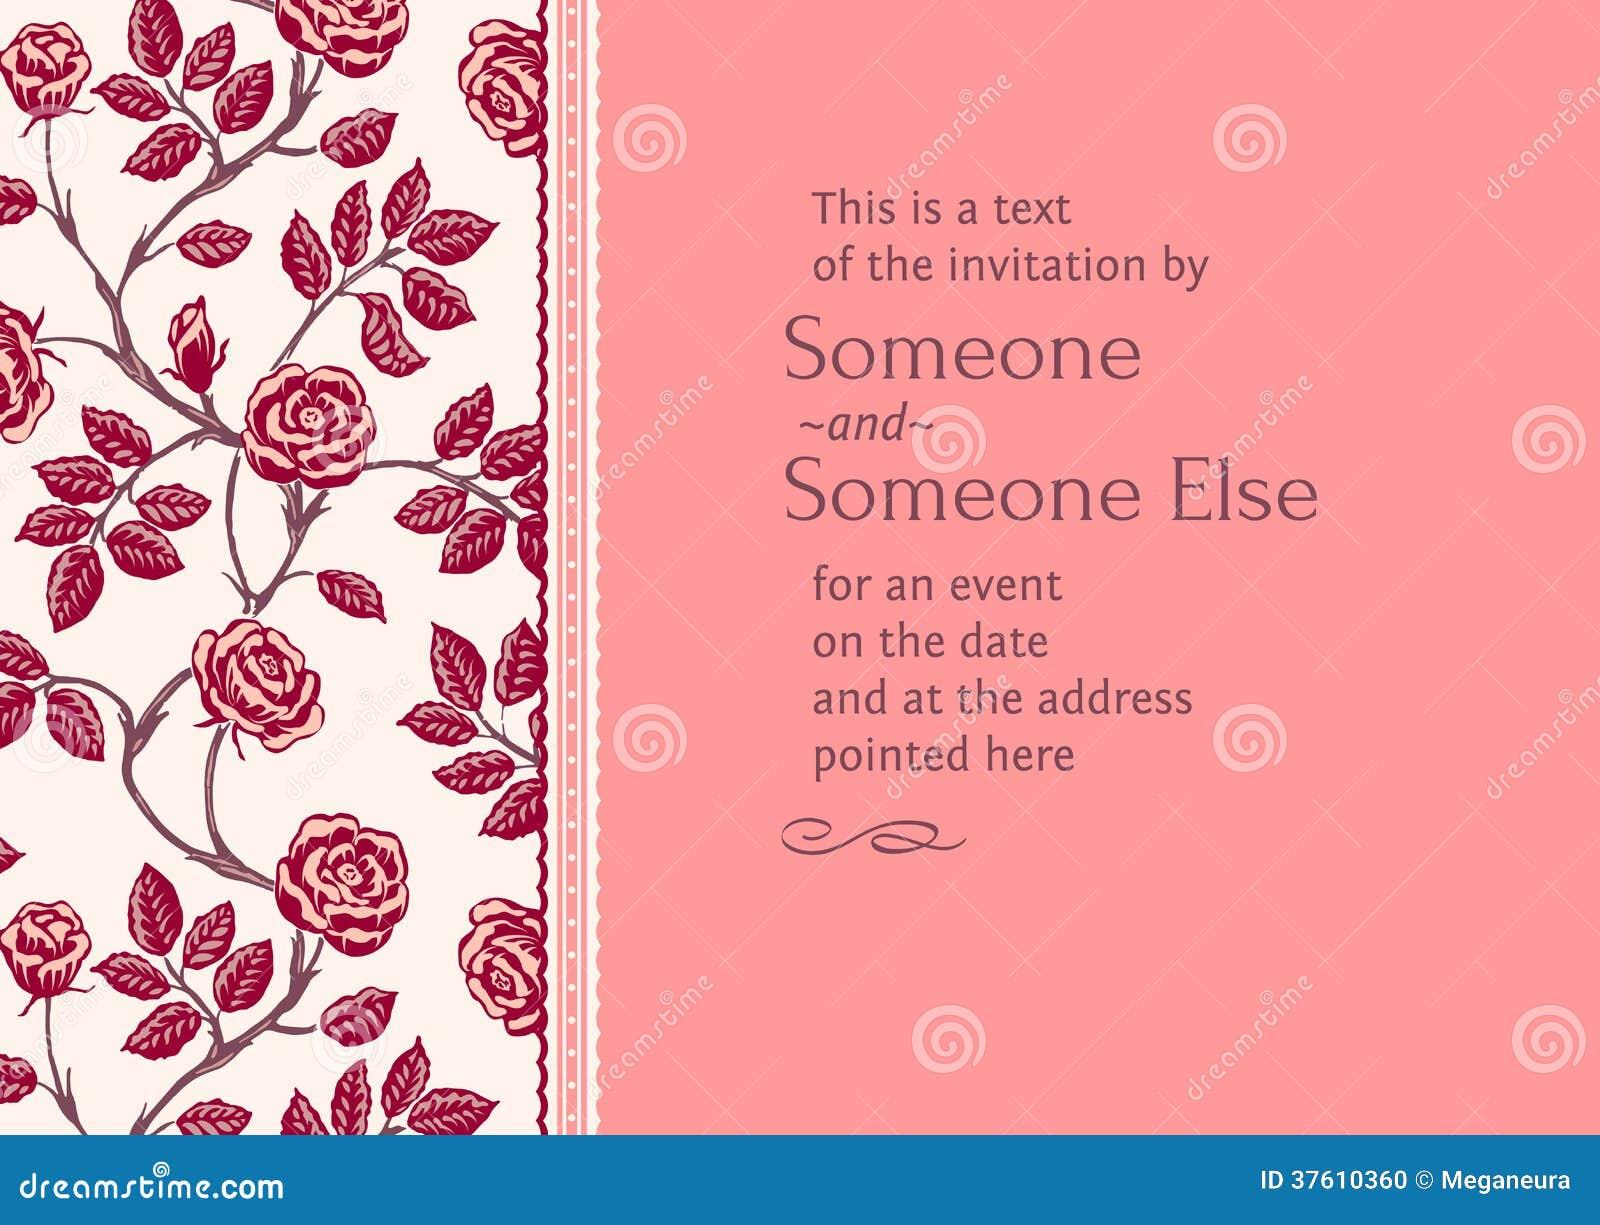 postcard invitation editable template with frame stock. Black Bedroom Furniture Sets. Home Design Ideas